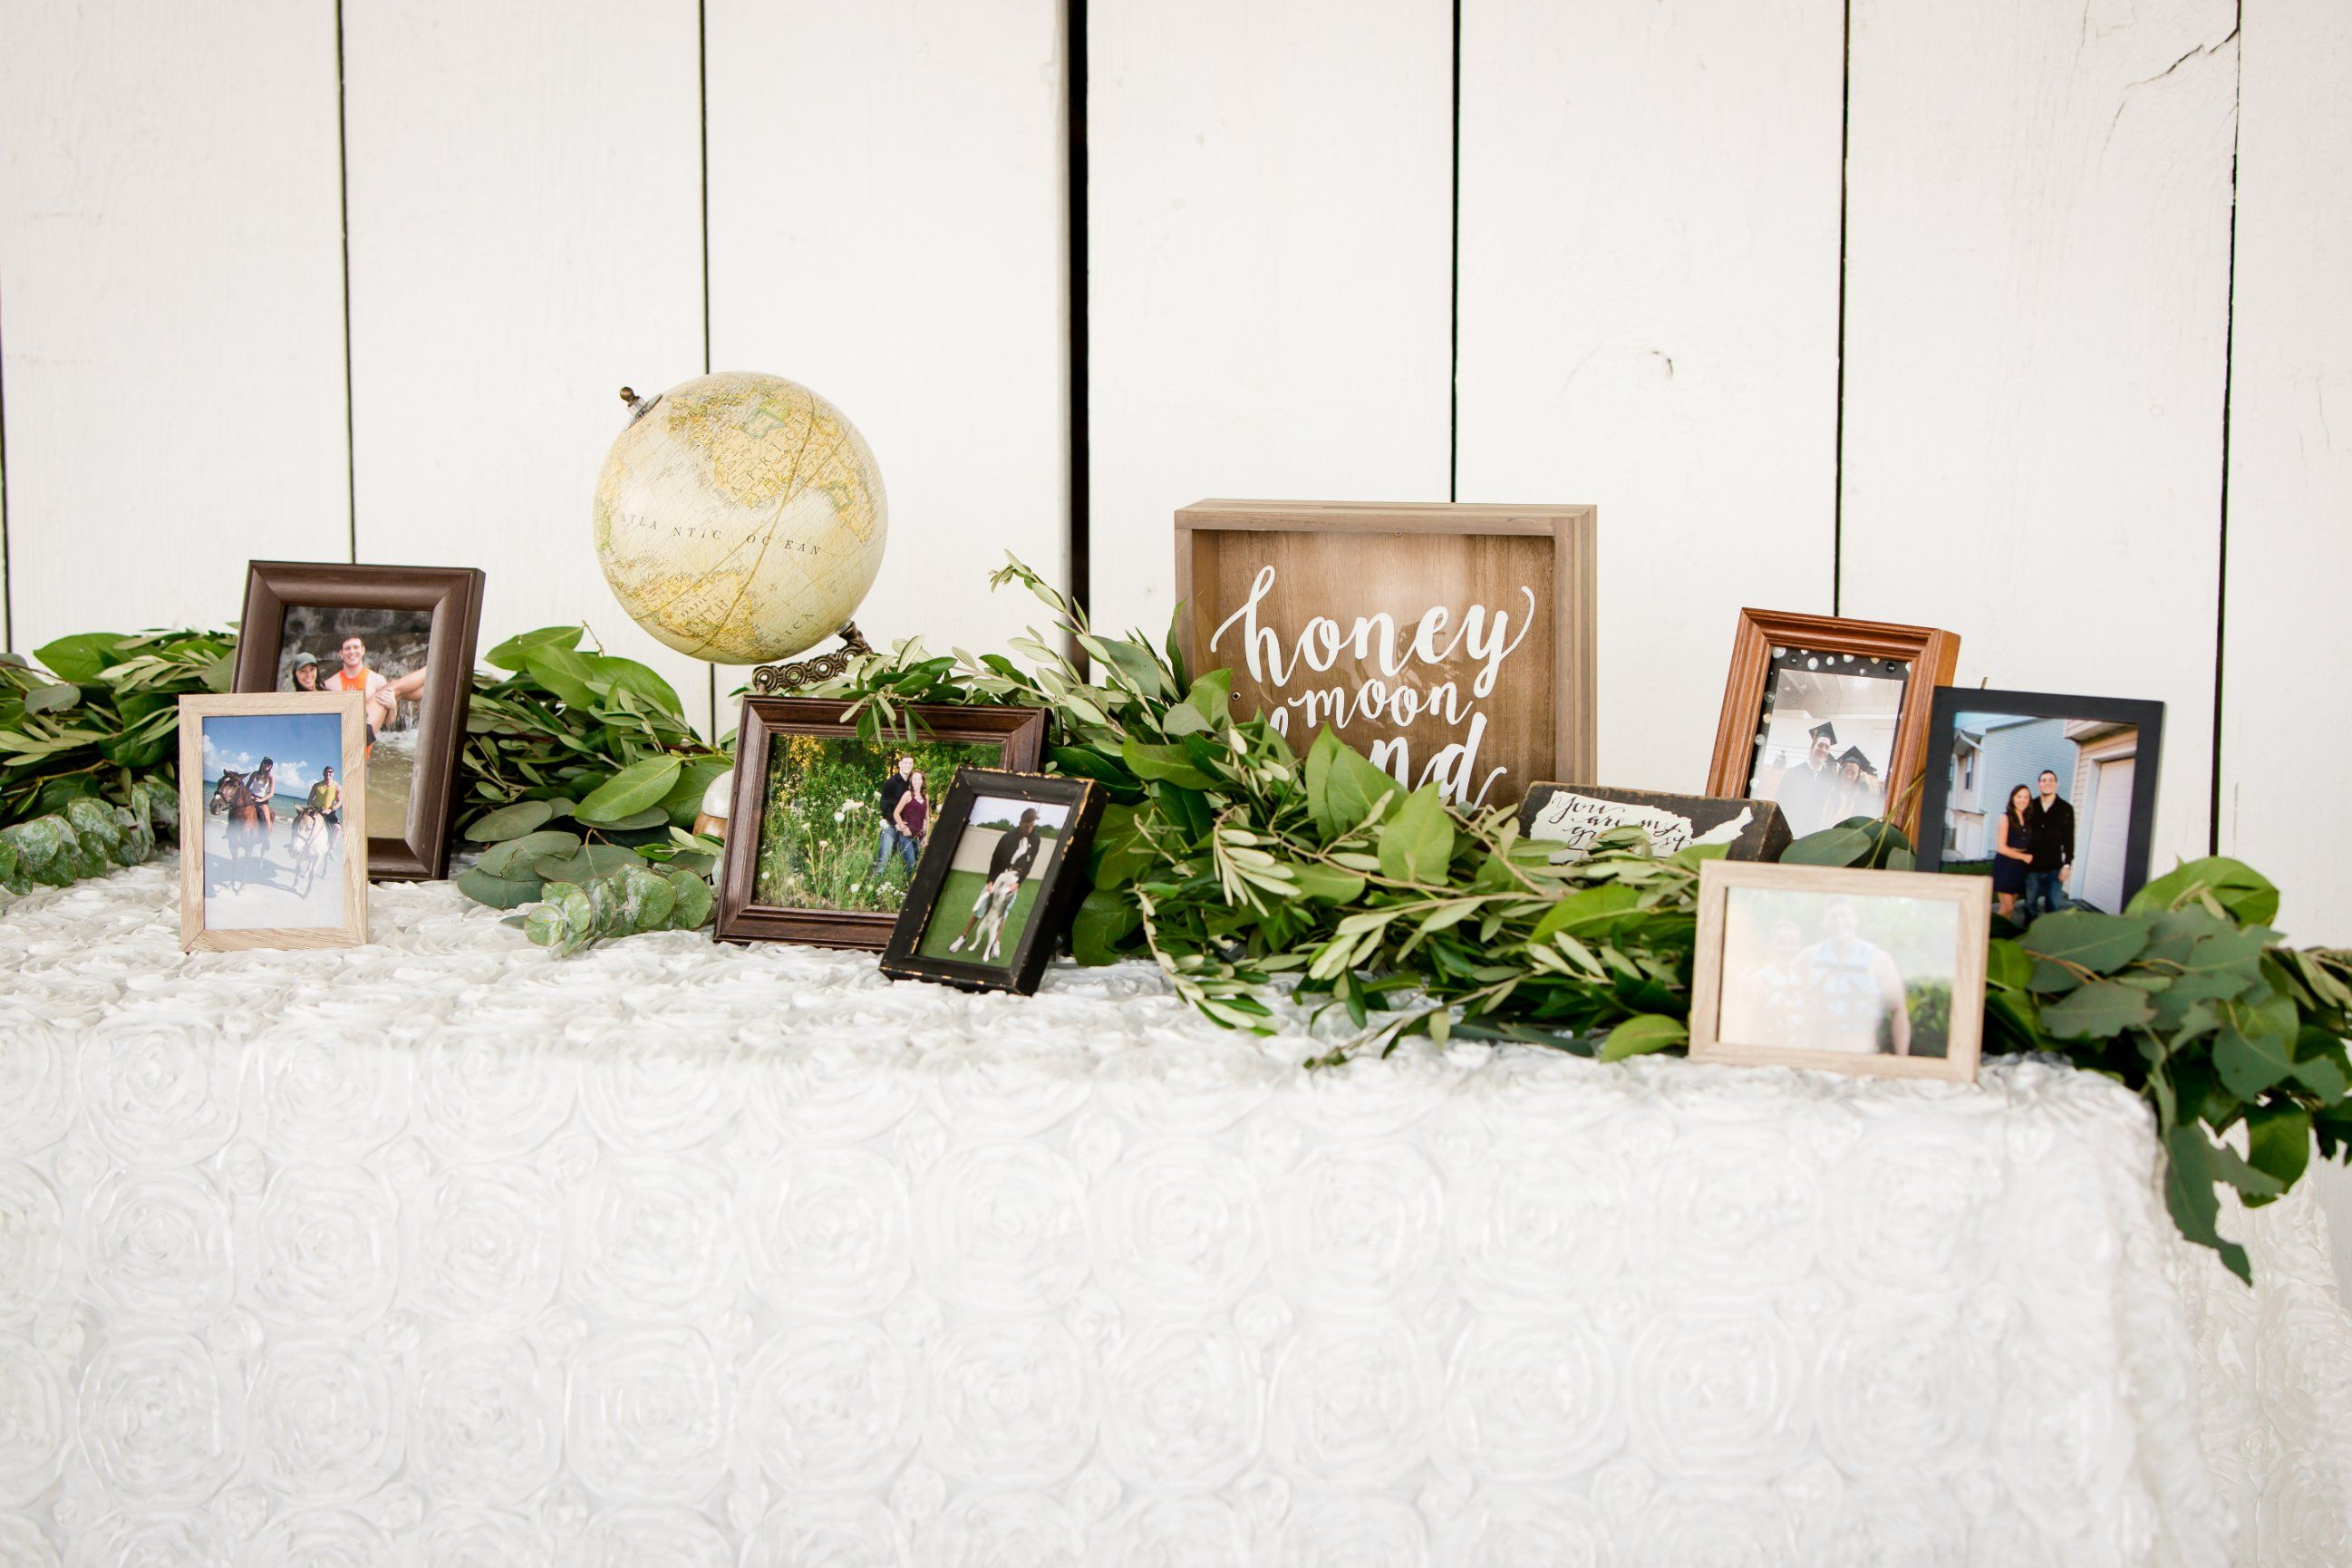  The Journey Home Wedding Venue   Kansas City Wedding ...